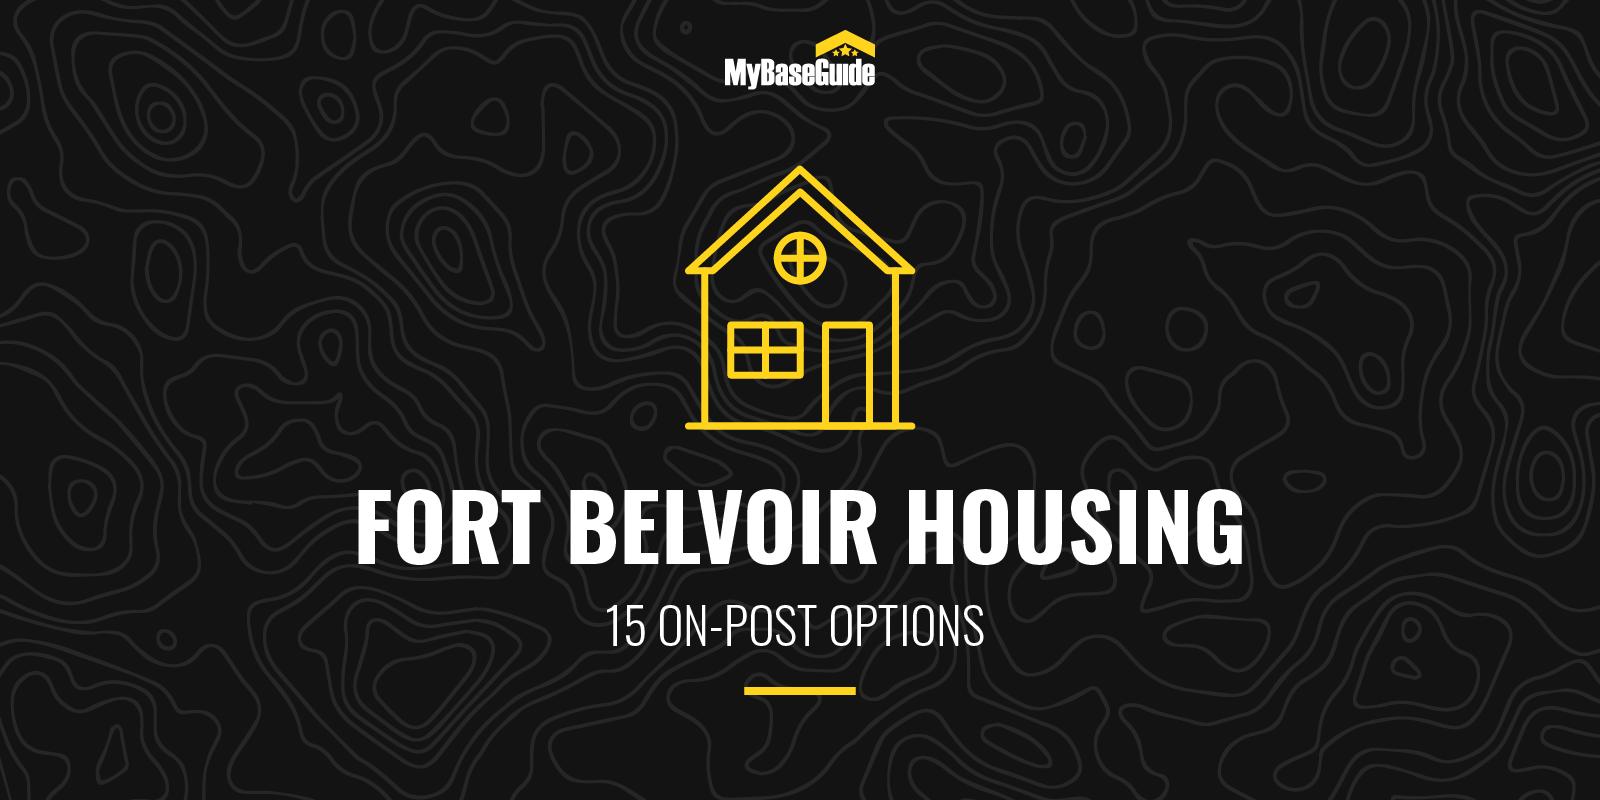 Fort Belvoir Housing: 15 On Post Options